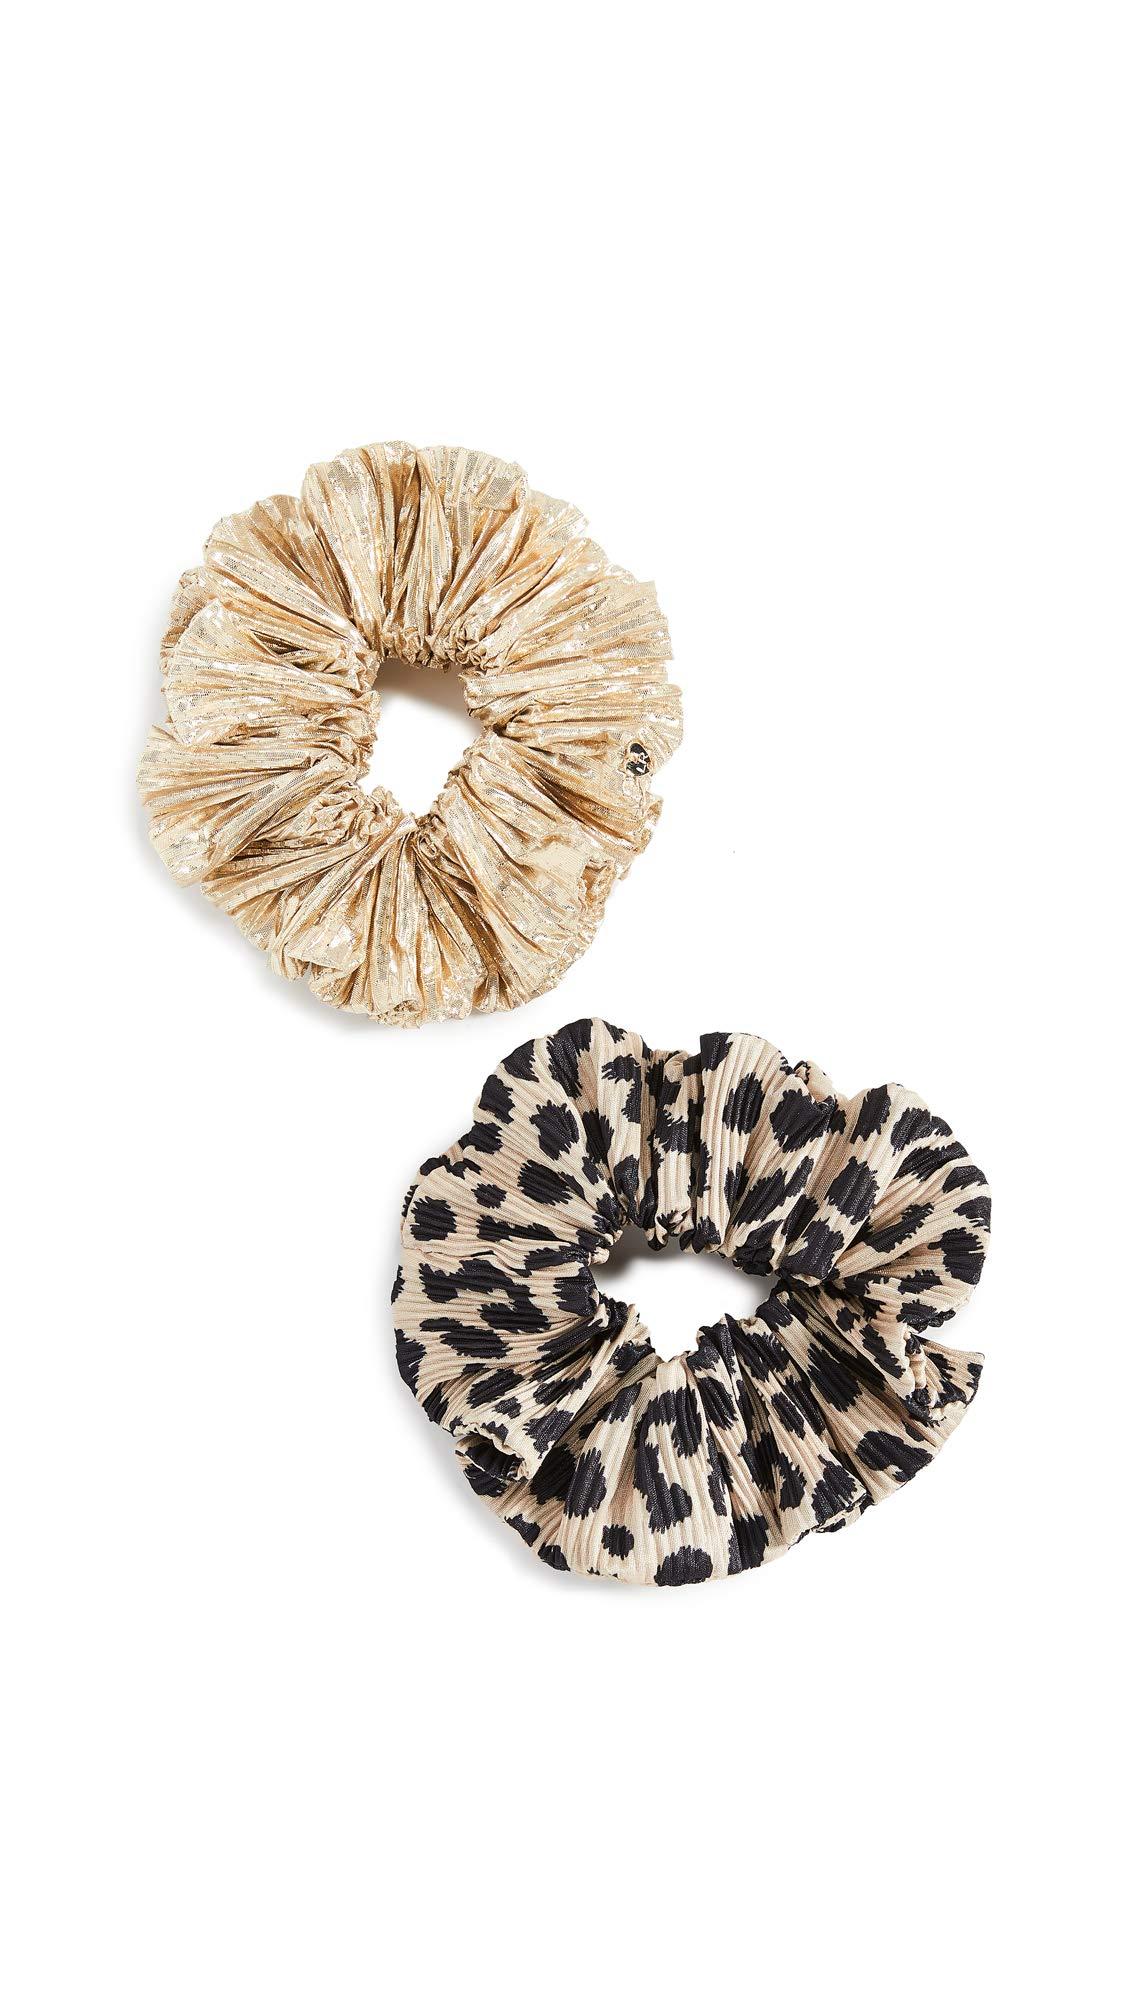 Loeffler Randall Women's Scrunchie Set, Leopard/Gold, One Size by Loeffler Randall